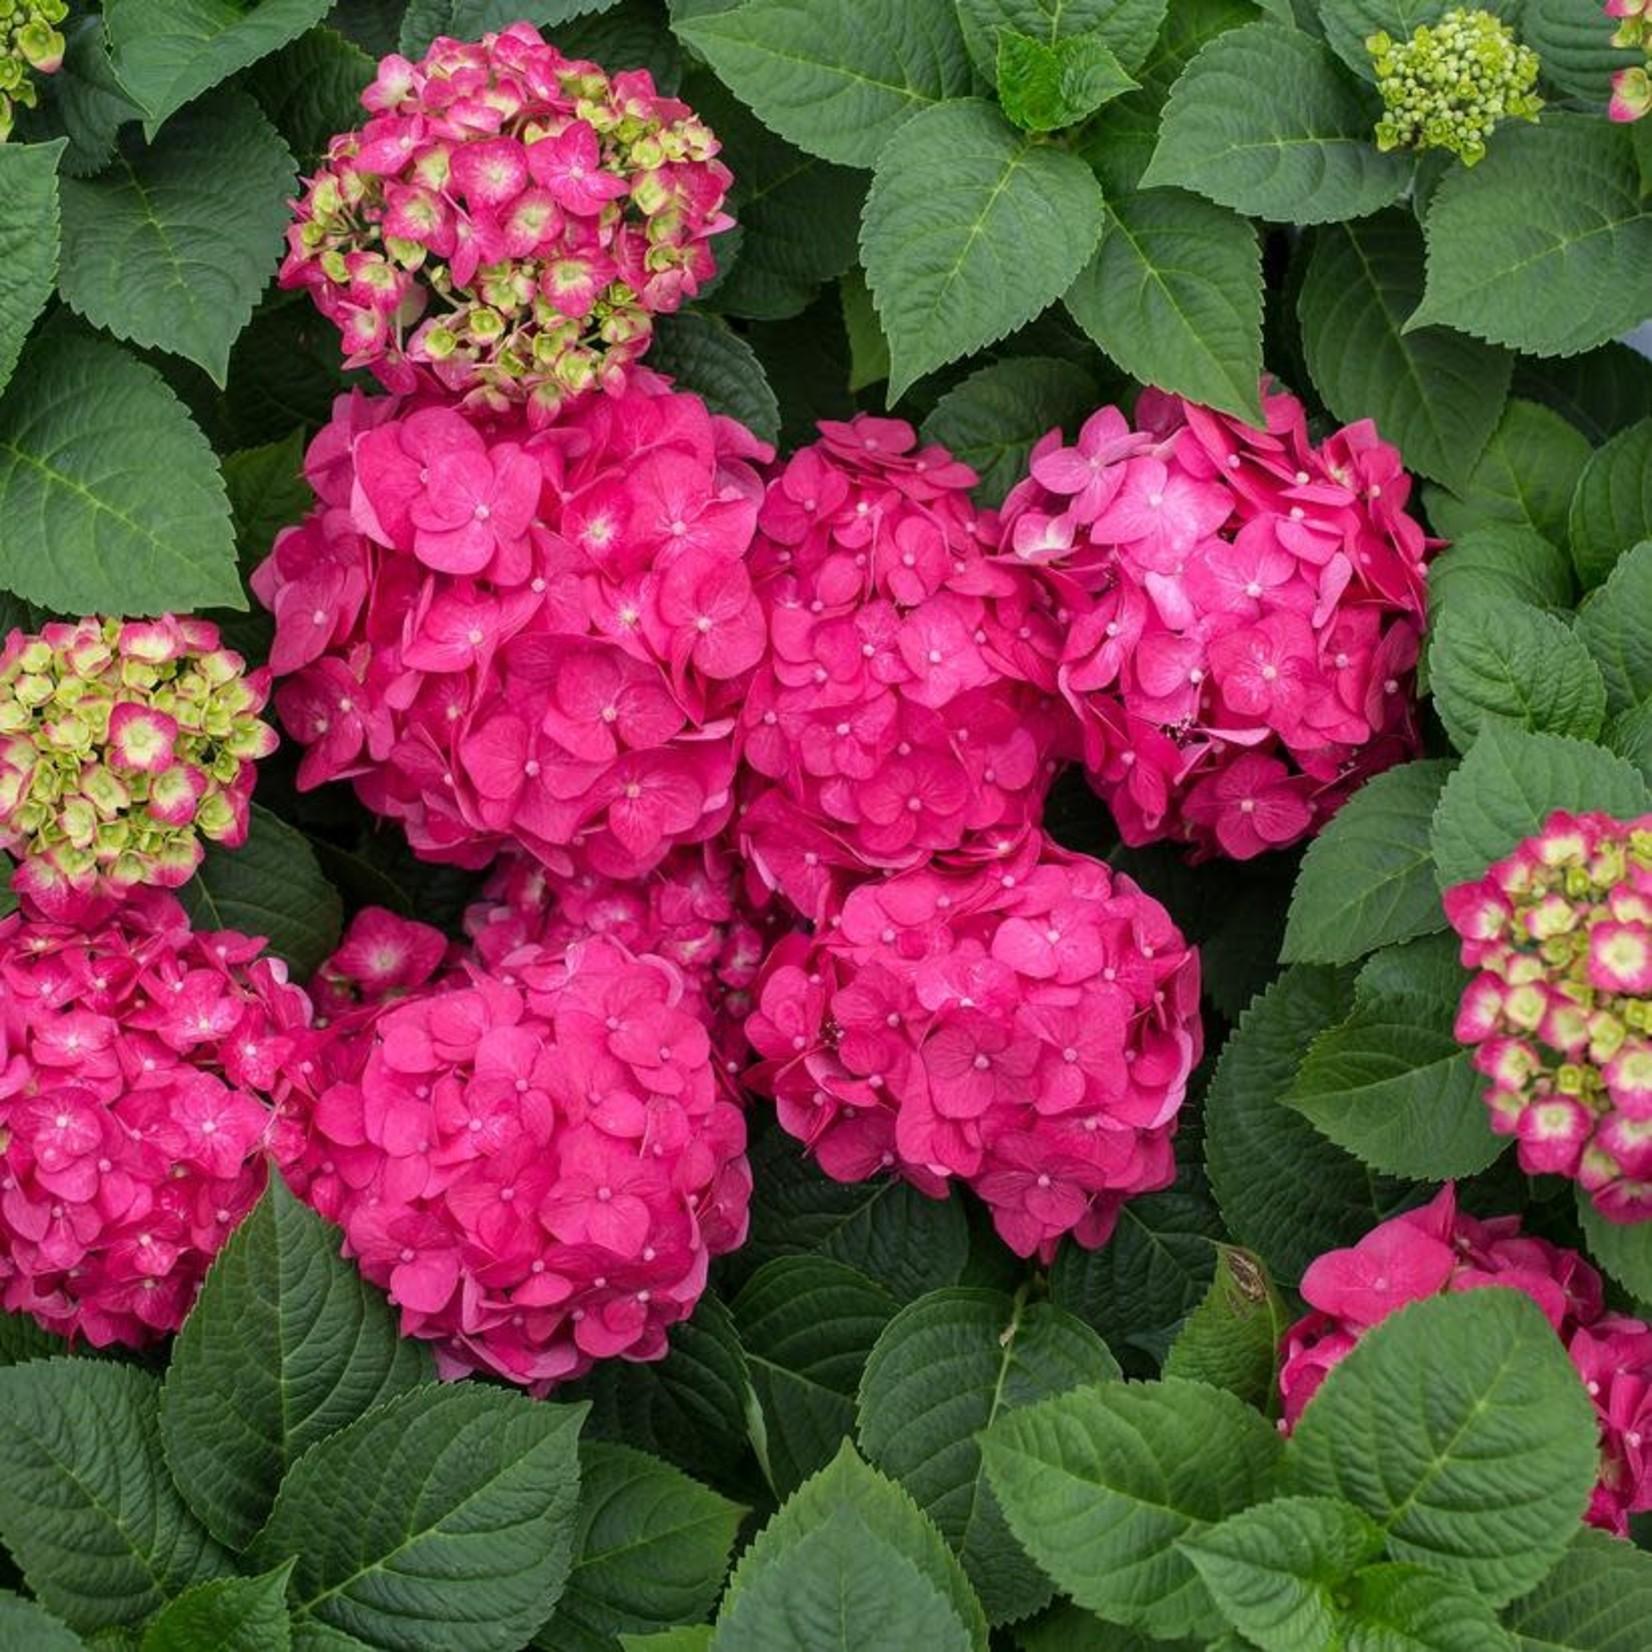 Hydrangea 'endless summer crush' 3 gal